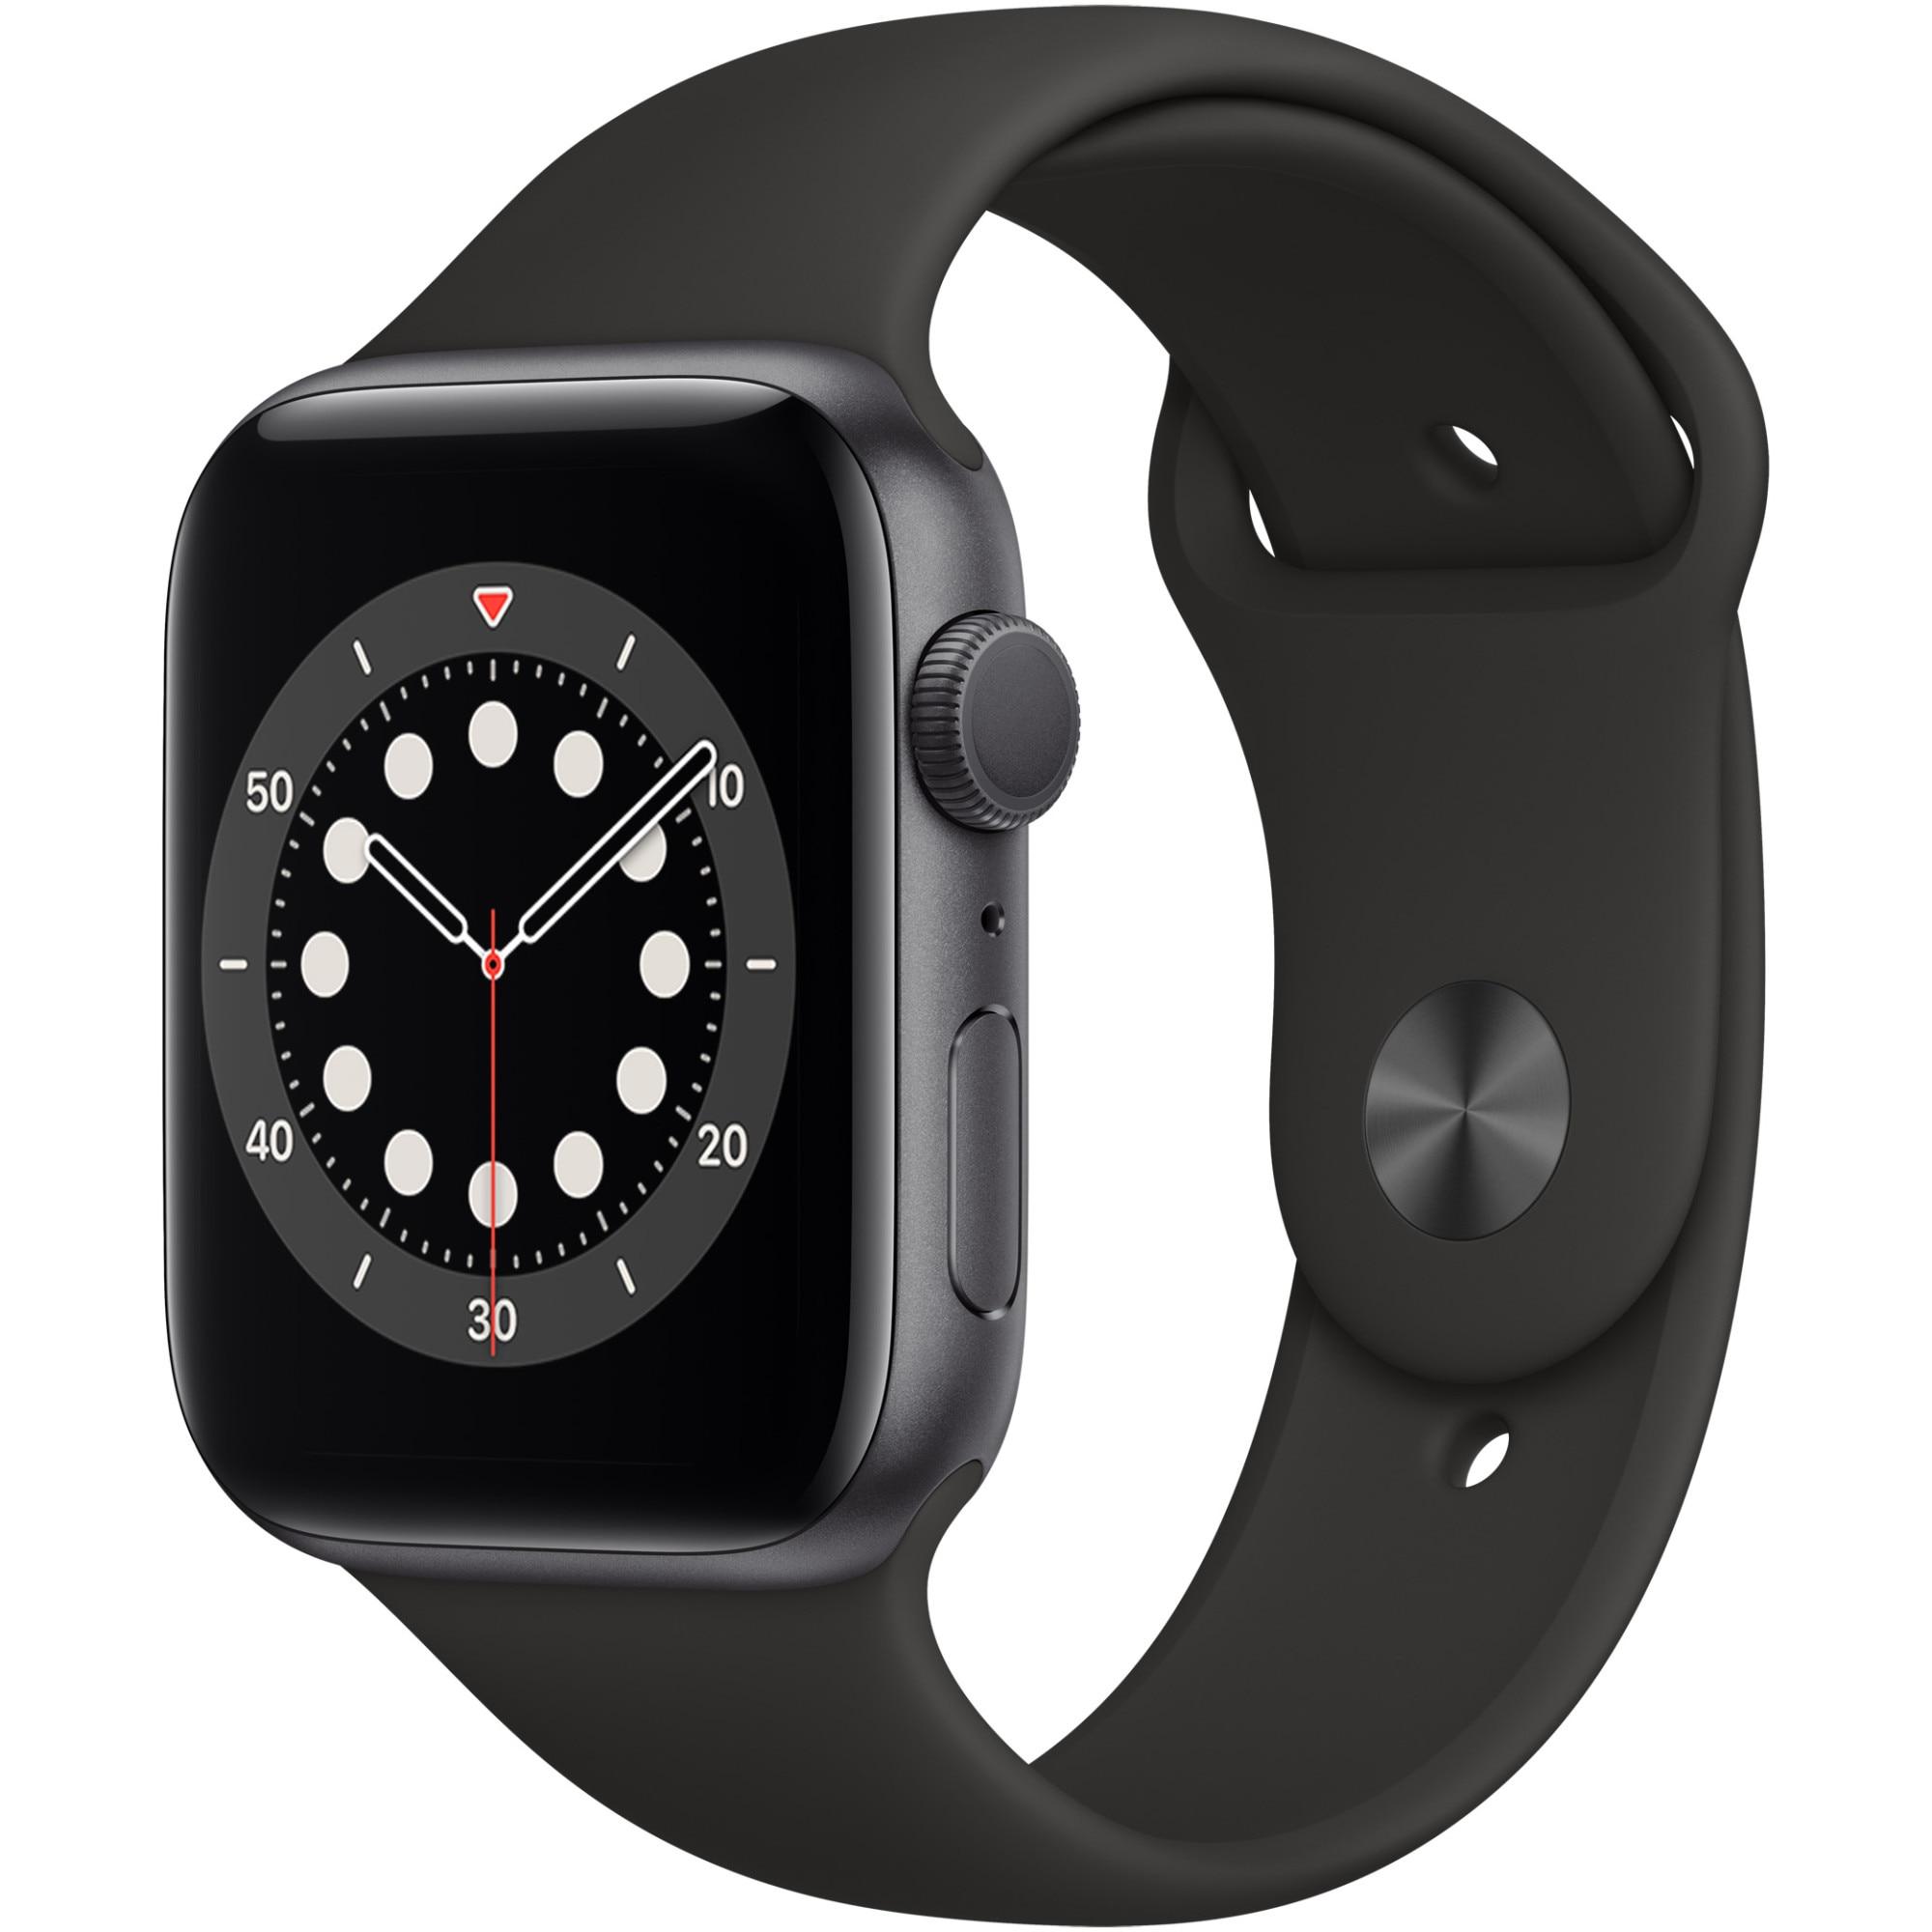 Fotografie Apple Watch 6, GPS, Carcasa Space Gray Aluminium 44mm, Black Sport Band